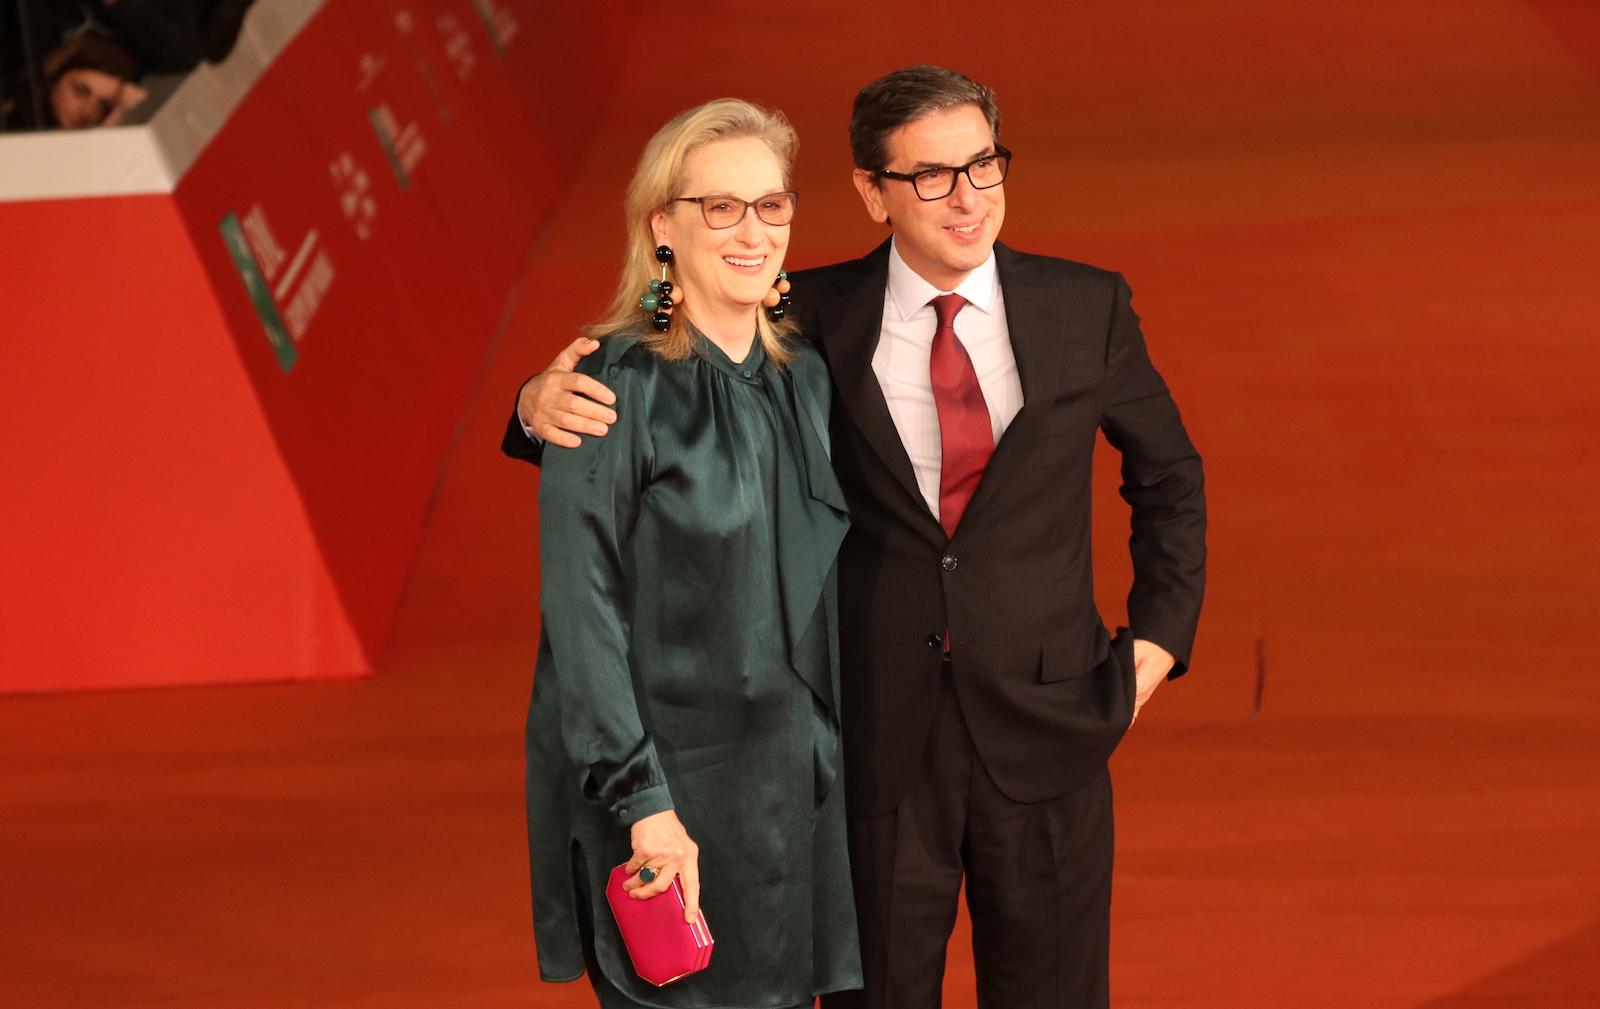 Roma 2016: Meryl Streep e Antonio Monda sul red carpet di Florence Foster Jenkins